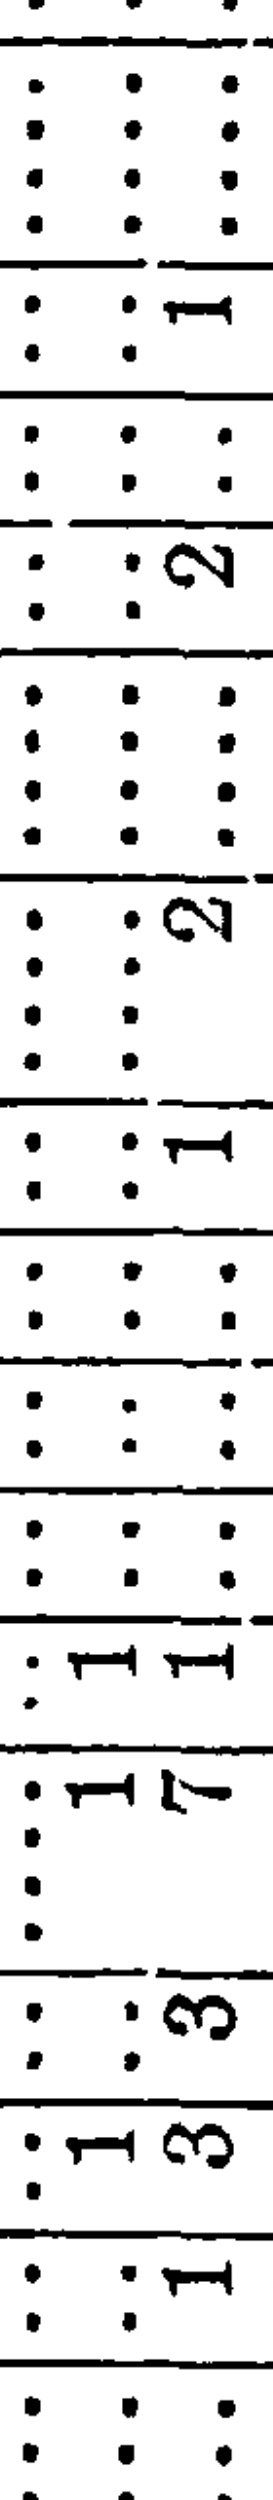 [merged small][ocr errors][merged small][ocr errors][merged small][merged small][merged small][merged small]